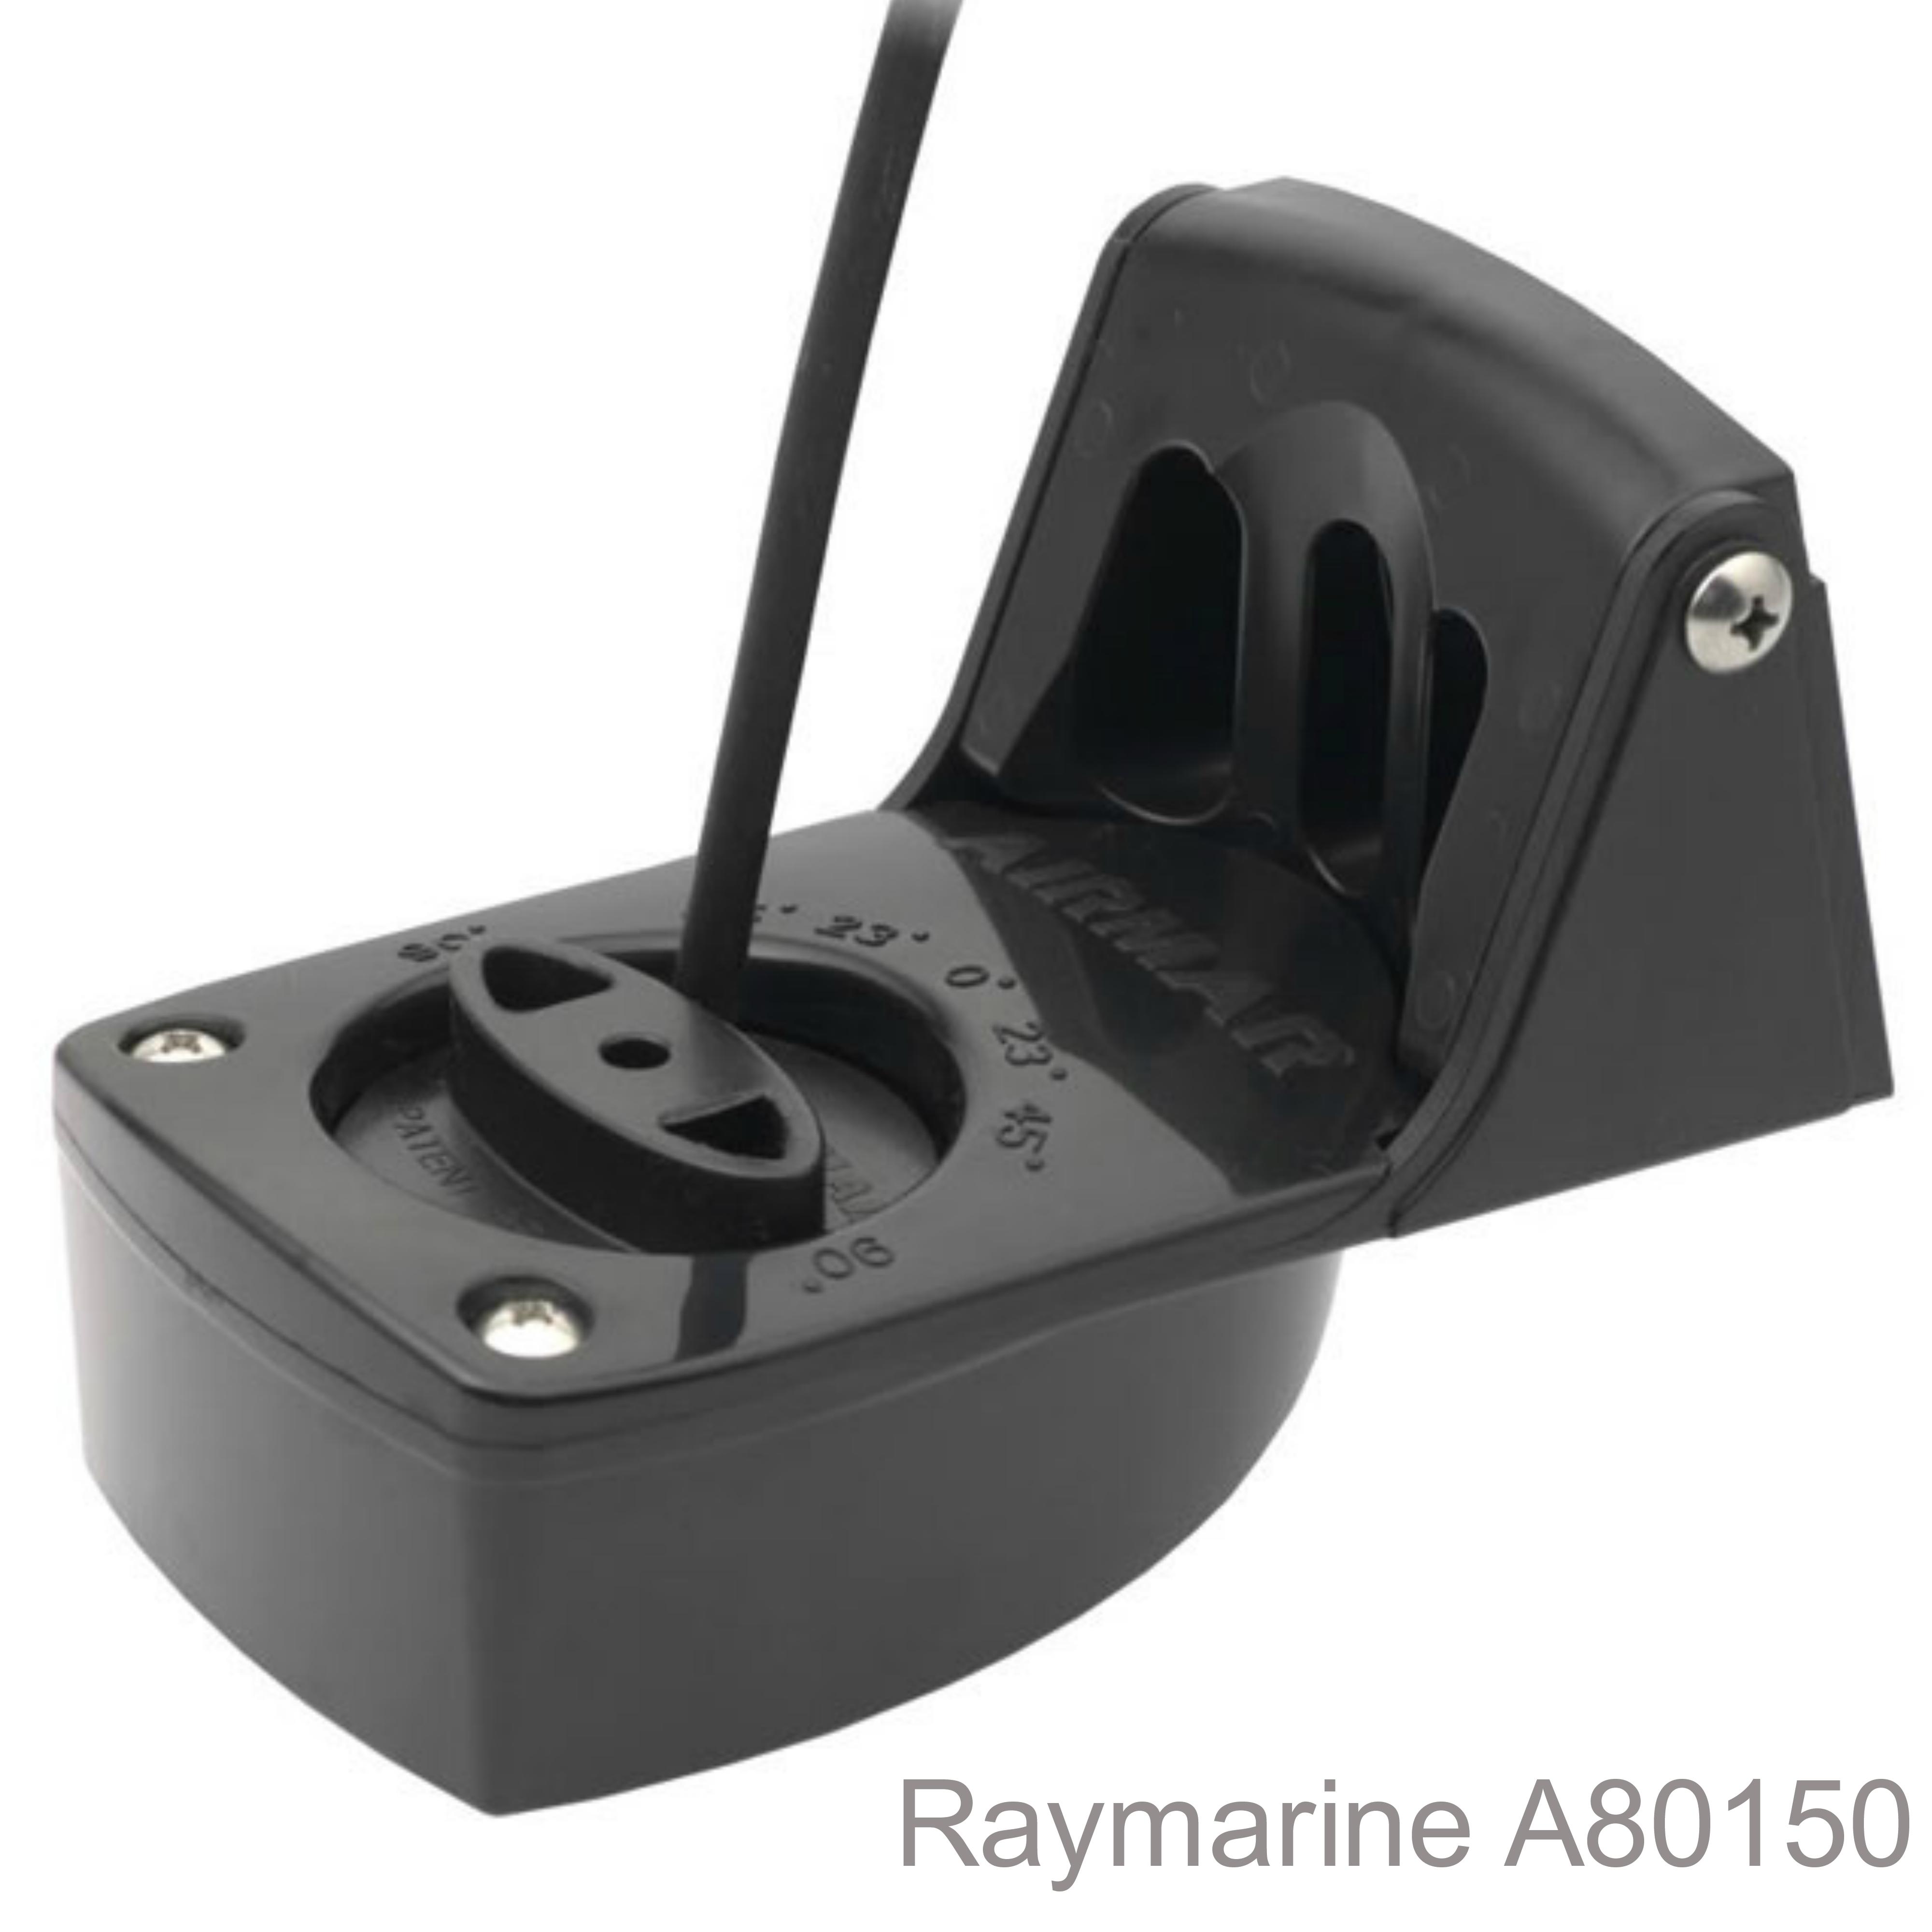 Raymarine P48 Plastic Transom Mount Transducer|Depth&Temp|100W RMS|7.6m Cable